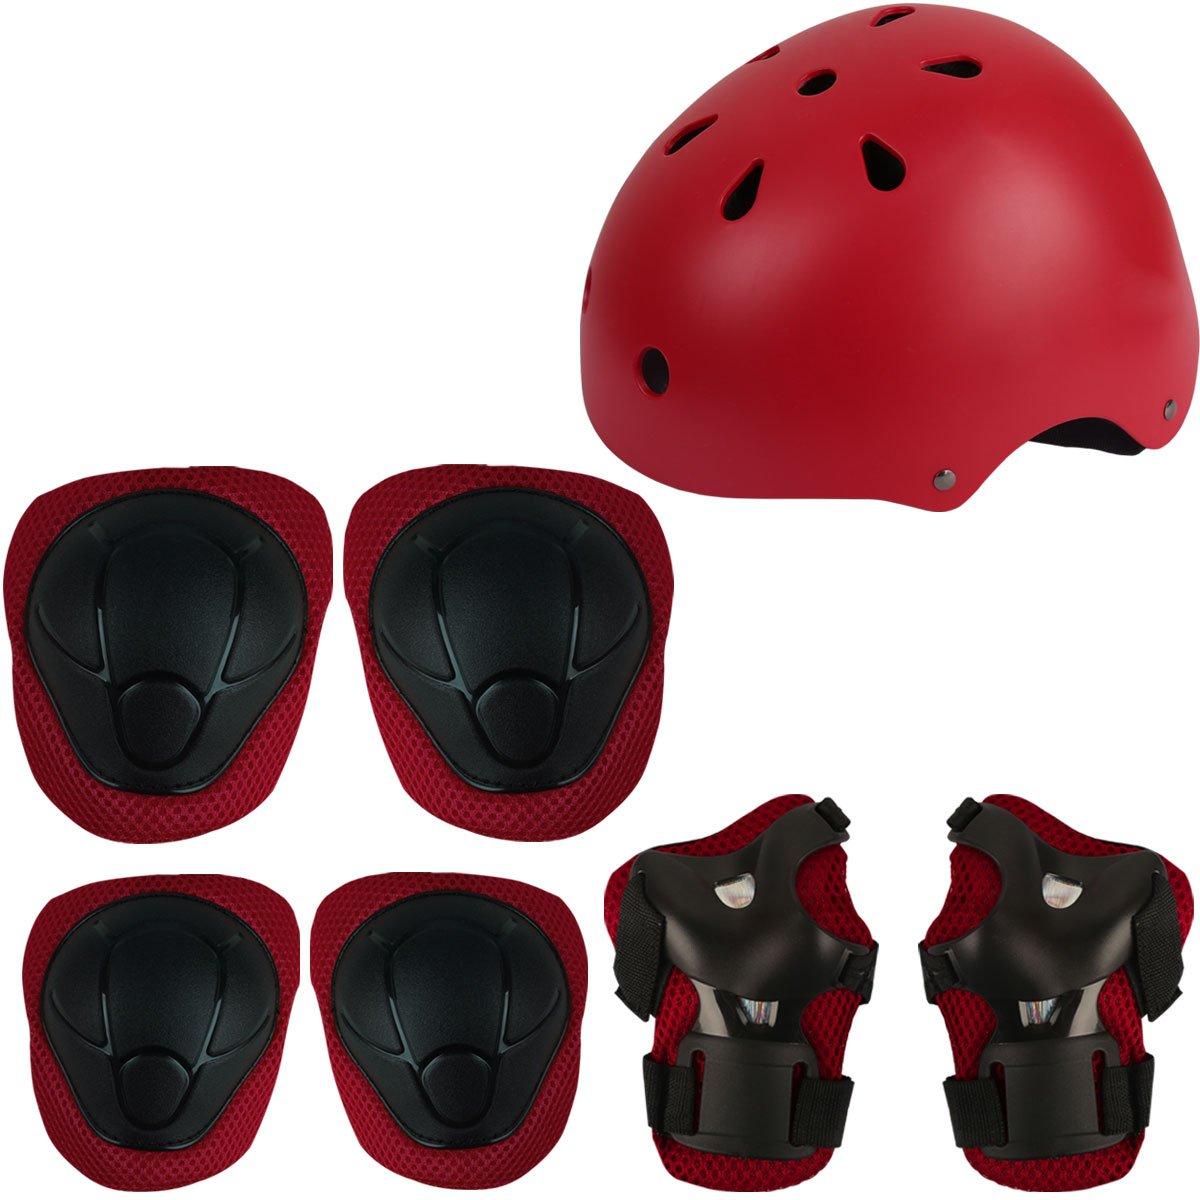 Herbalcandybox Kid's Protective Gear Set with Wrist Guard Knee Pads Elbow Pads Helmet,Red